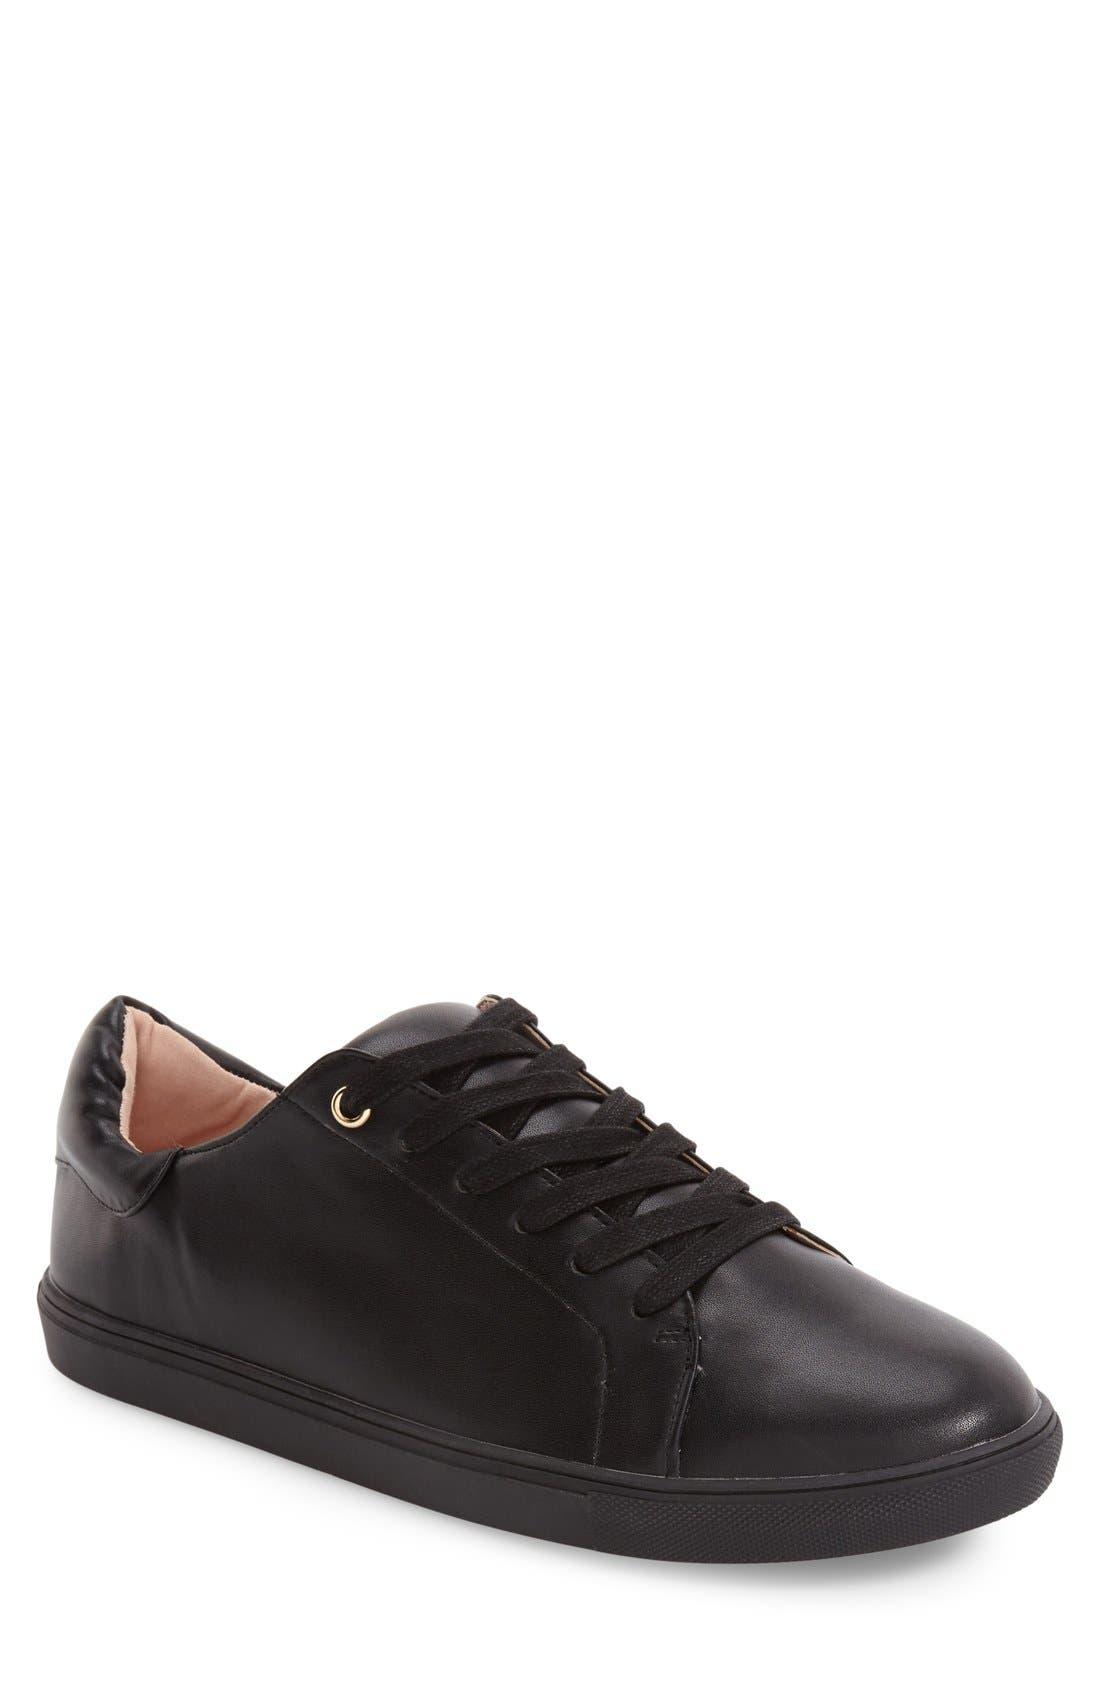 Catseye Sneaker,                             Main thumbnail 1, color,                             001